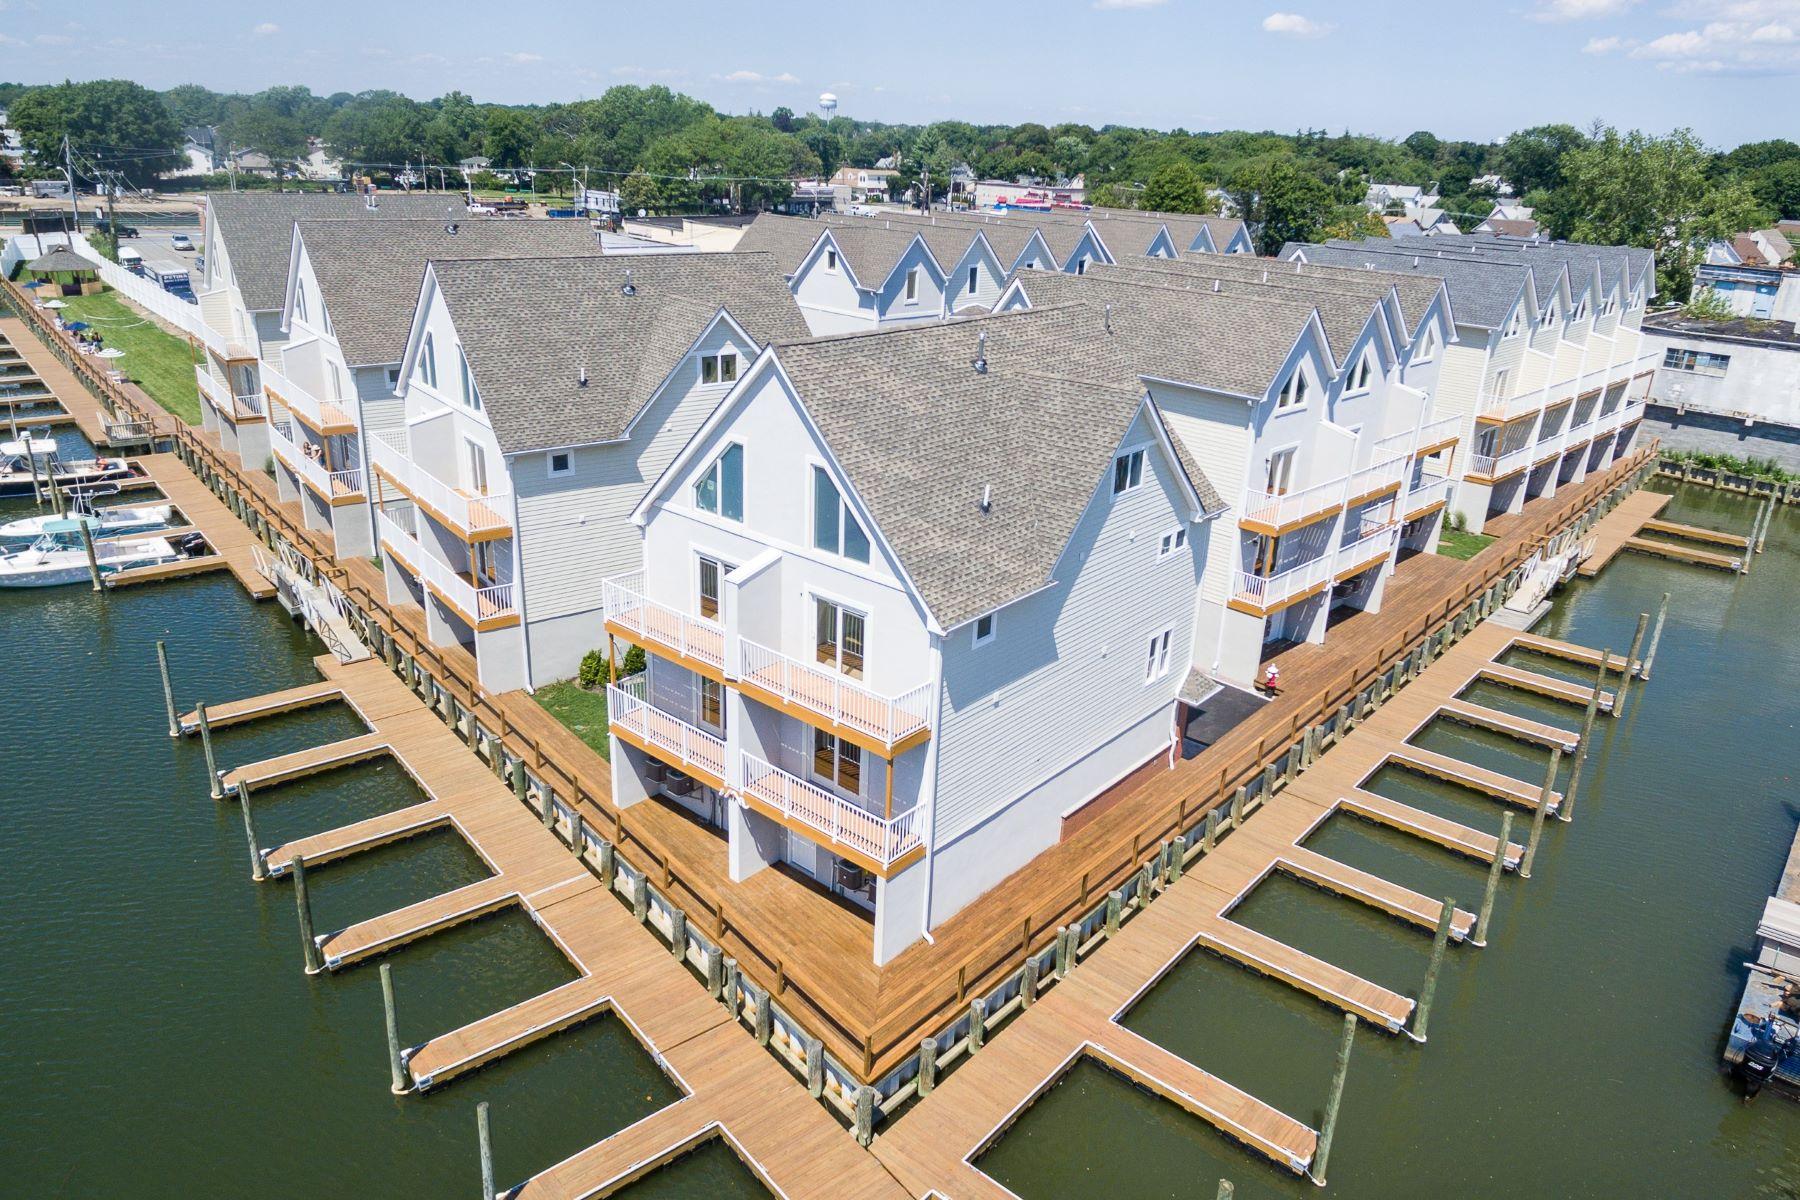 Condominium for Sale at Condo 531 Ray St 17 Freeport, New York 11520 United States